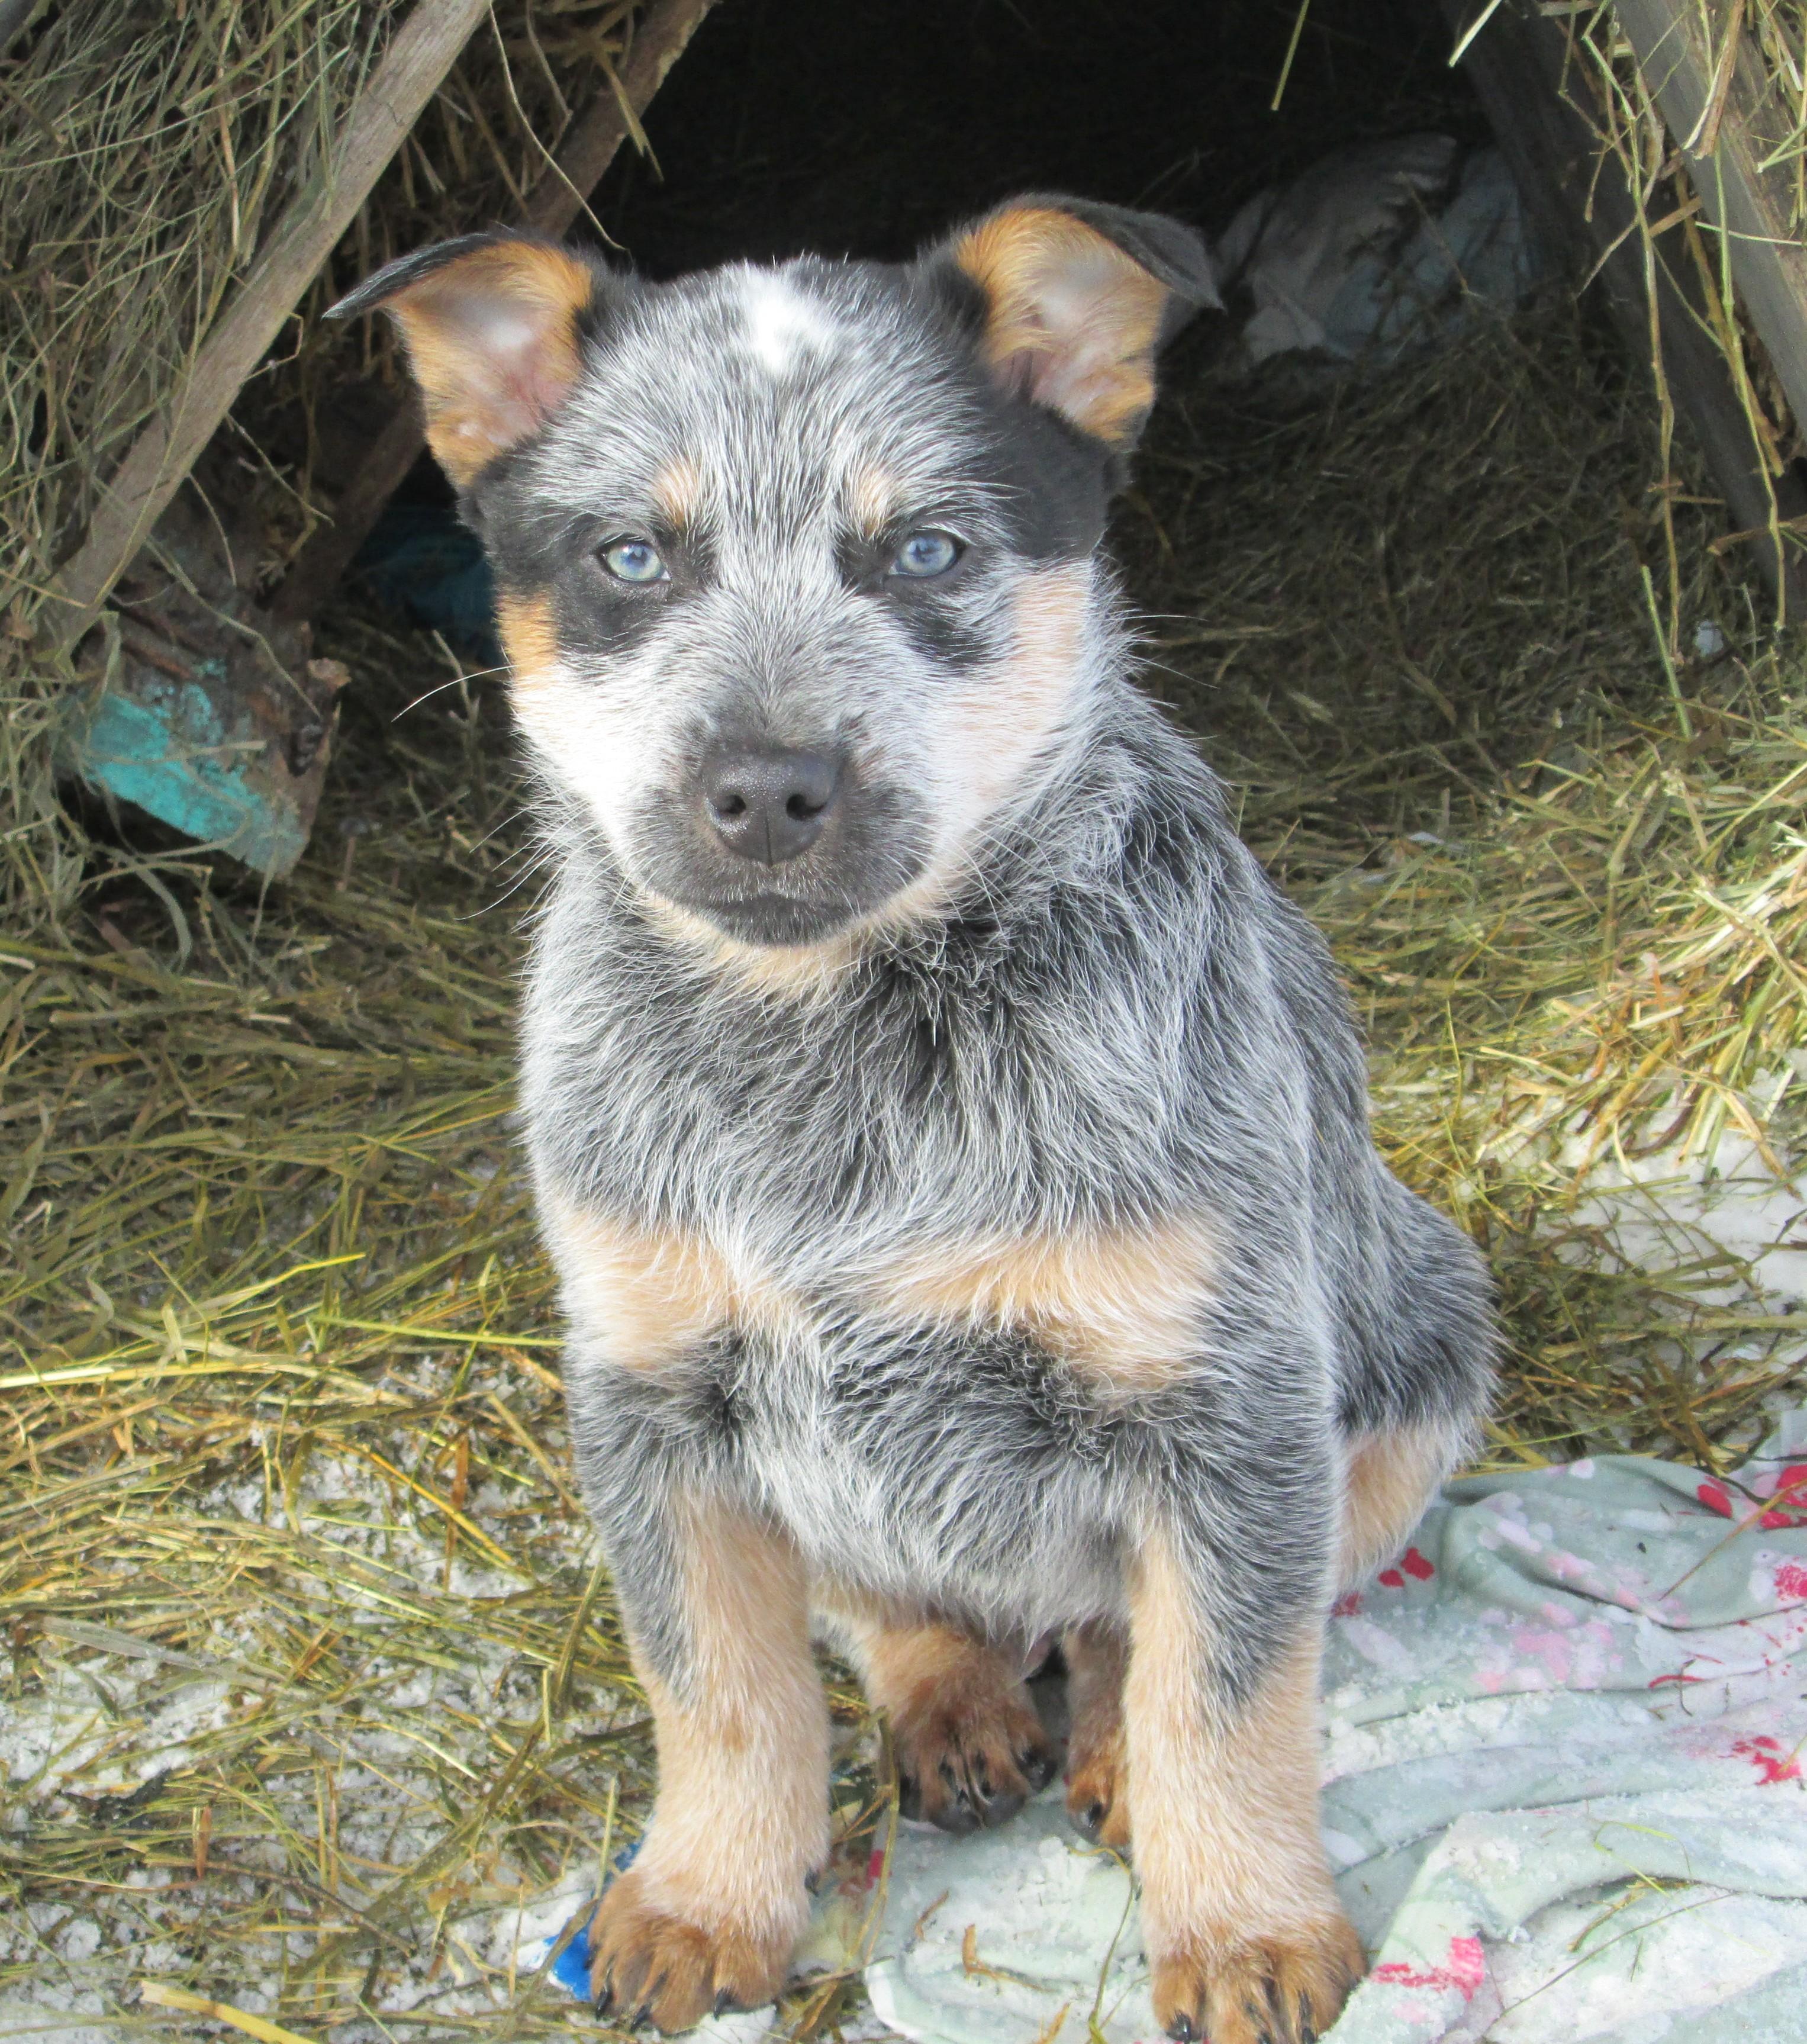 Blue Heeler Dogs Raised in Western Canada Saskatchewan